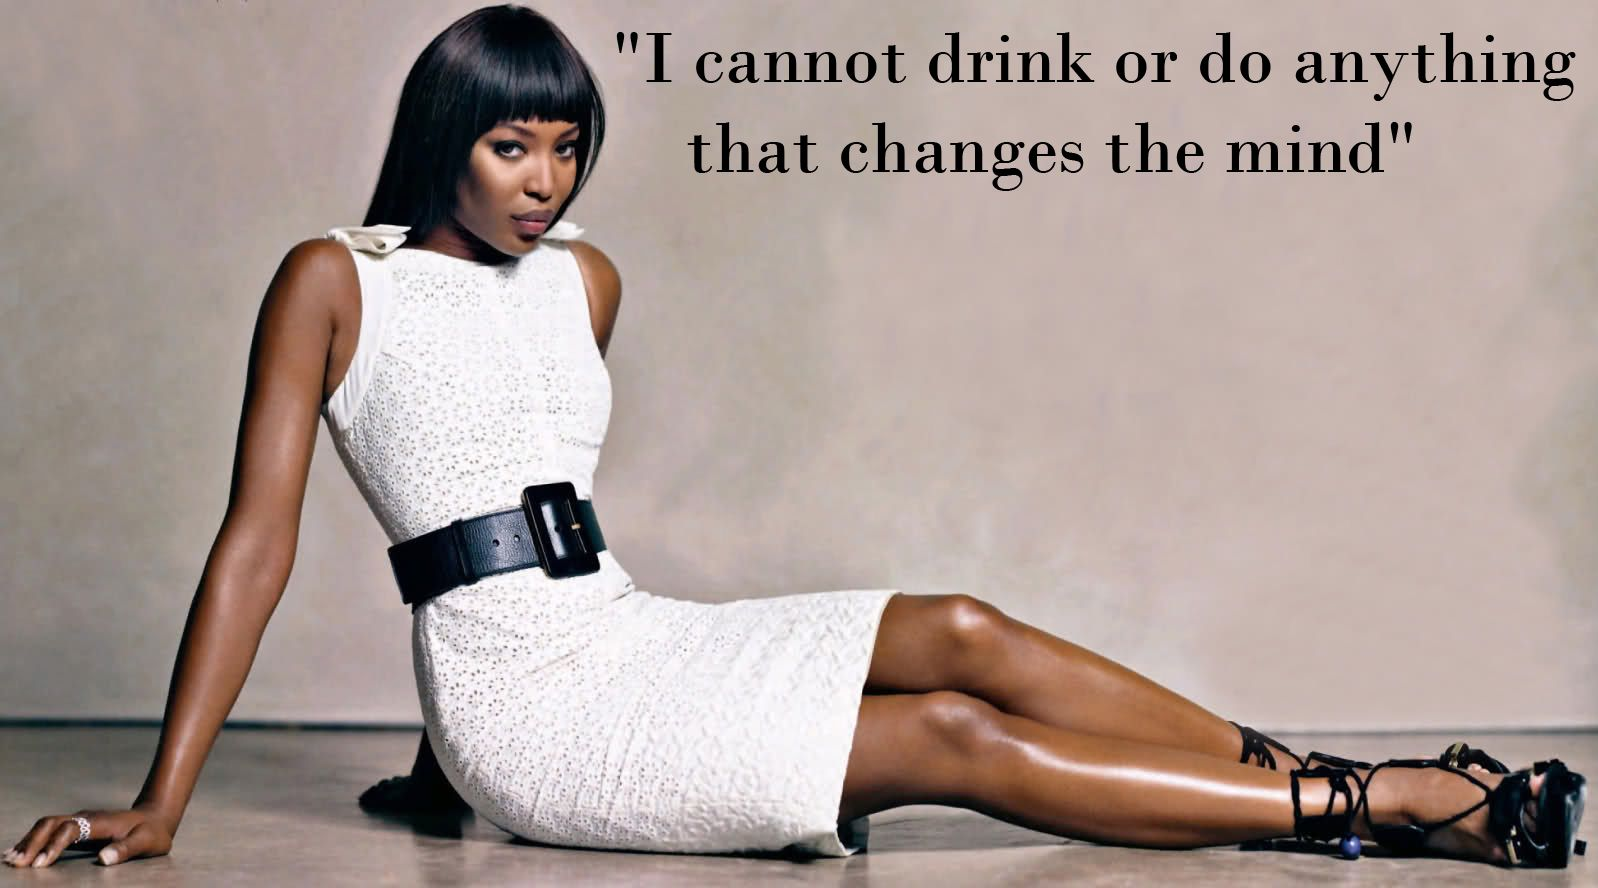 Naomi quote #2